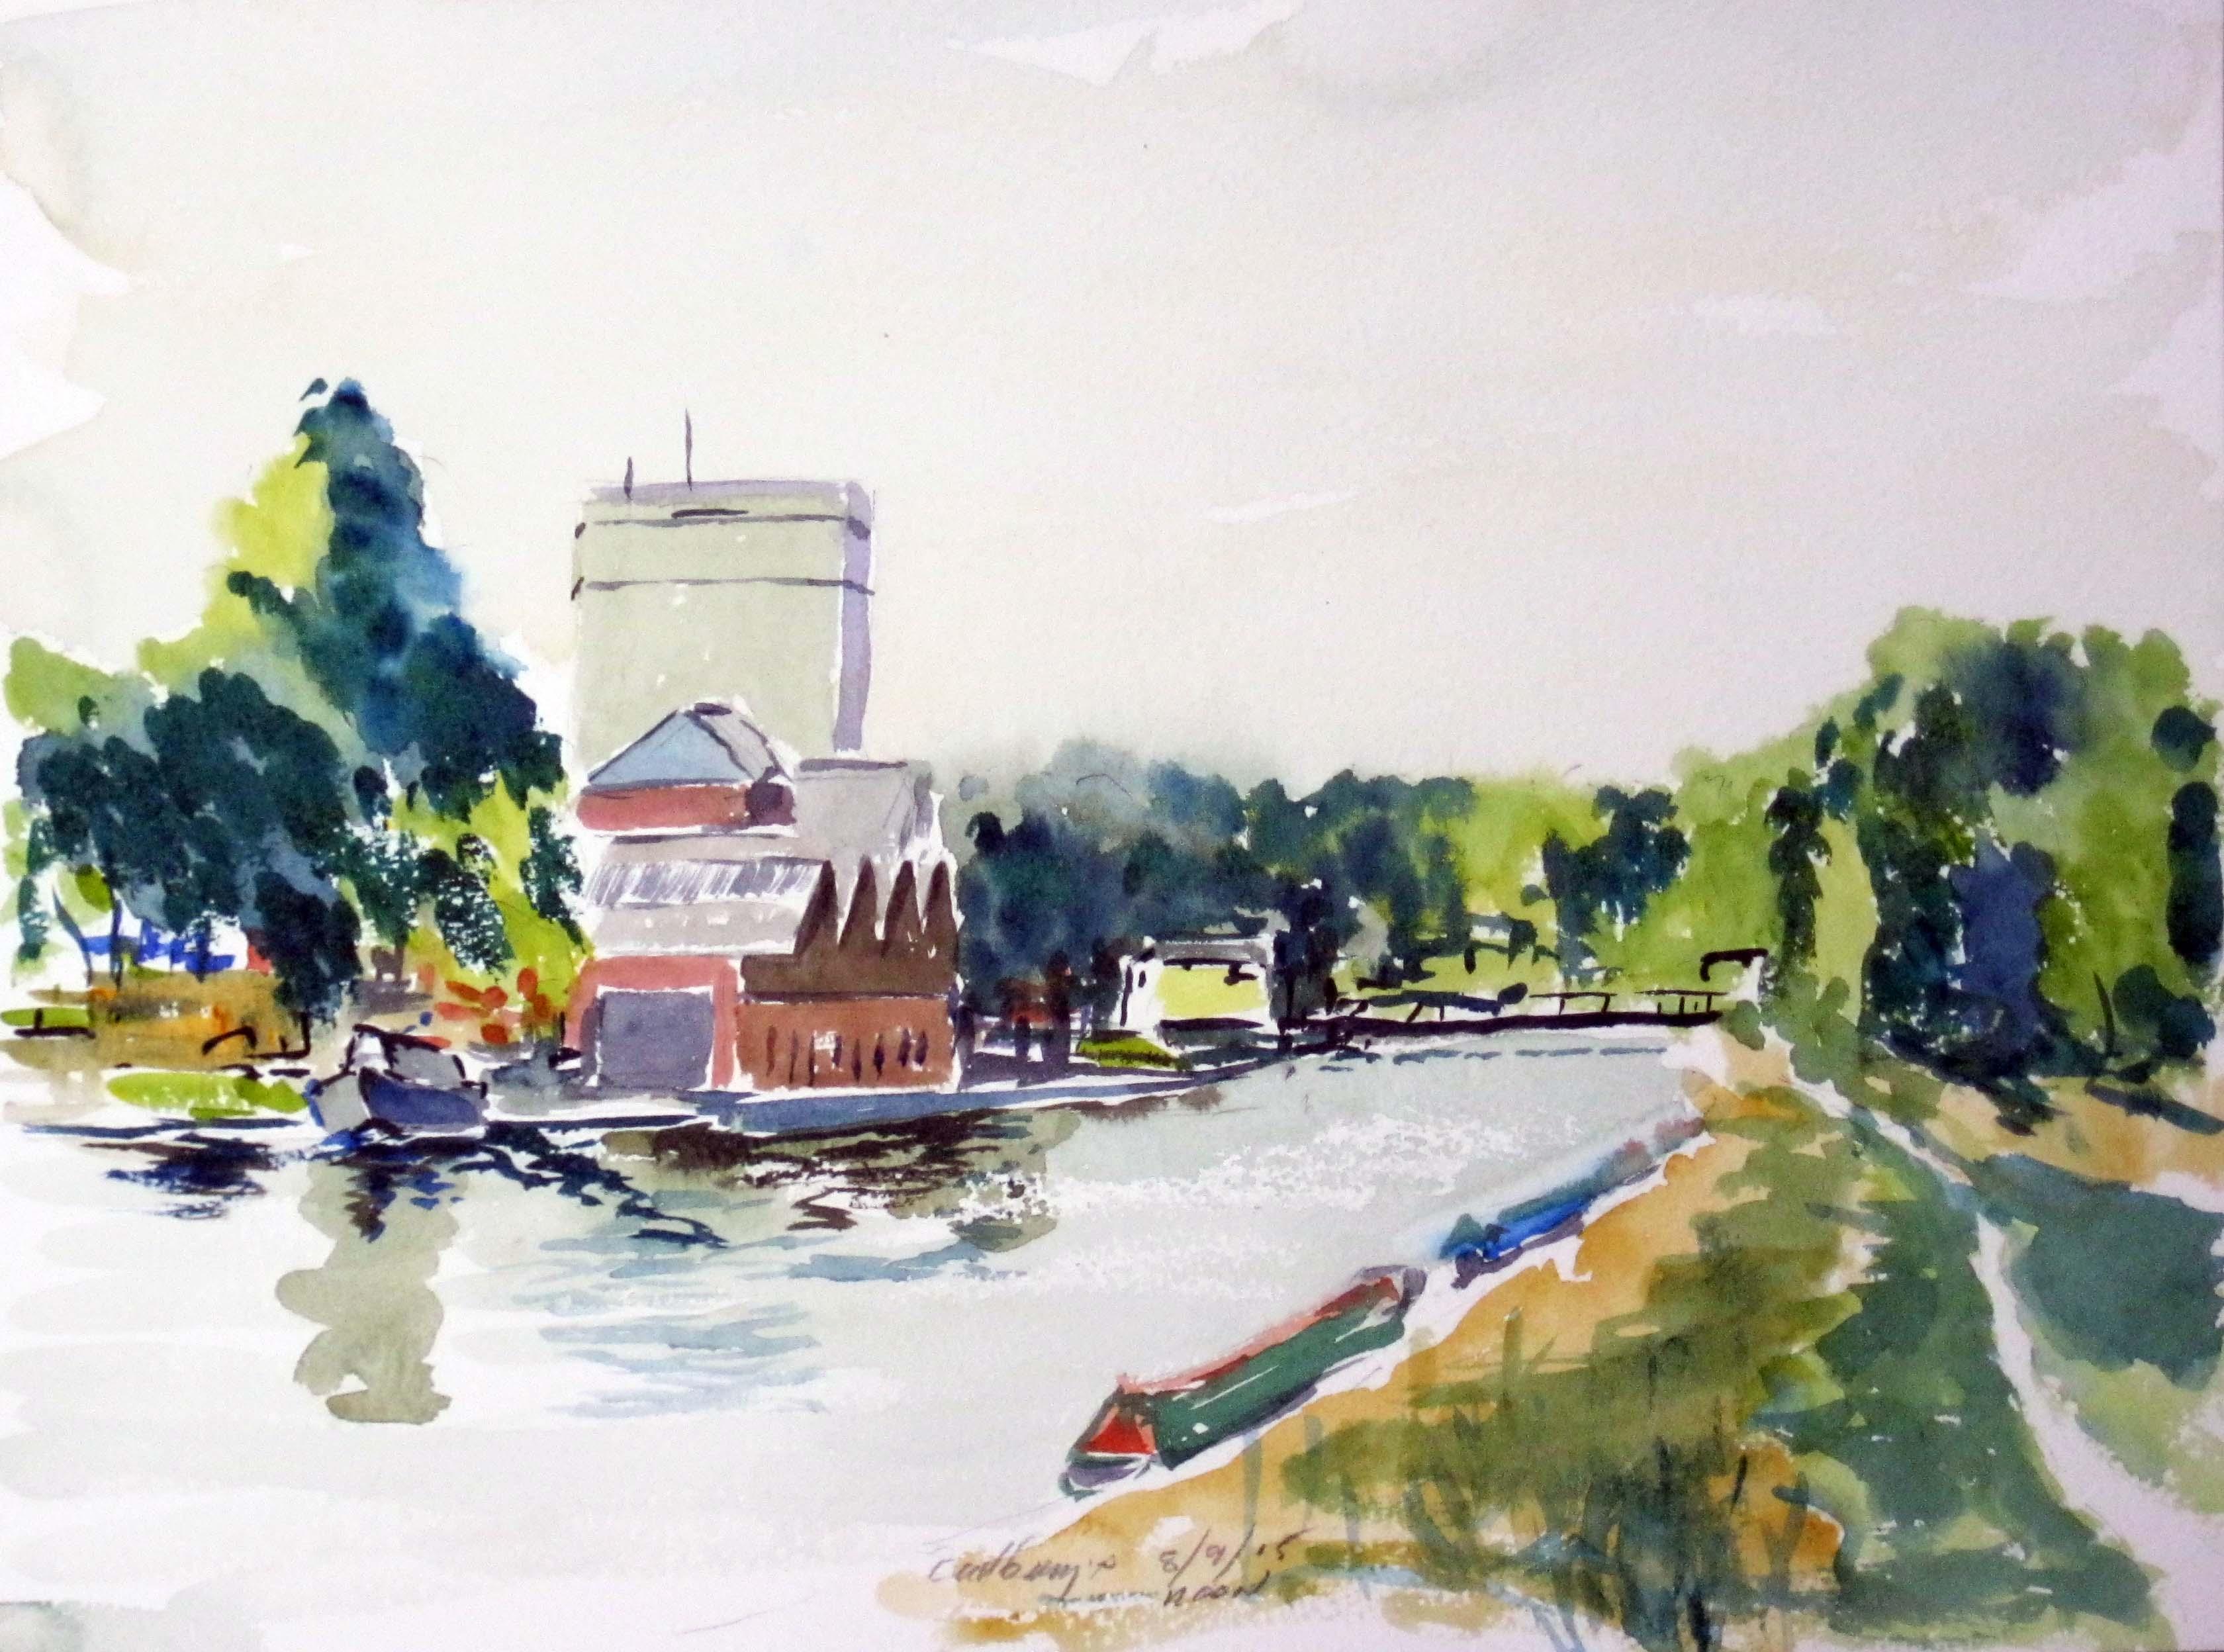 art classes for beginners, sefton, liverpool, merseyside